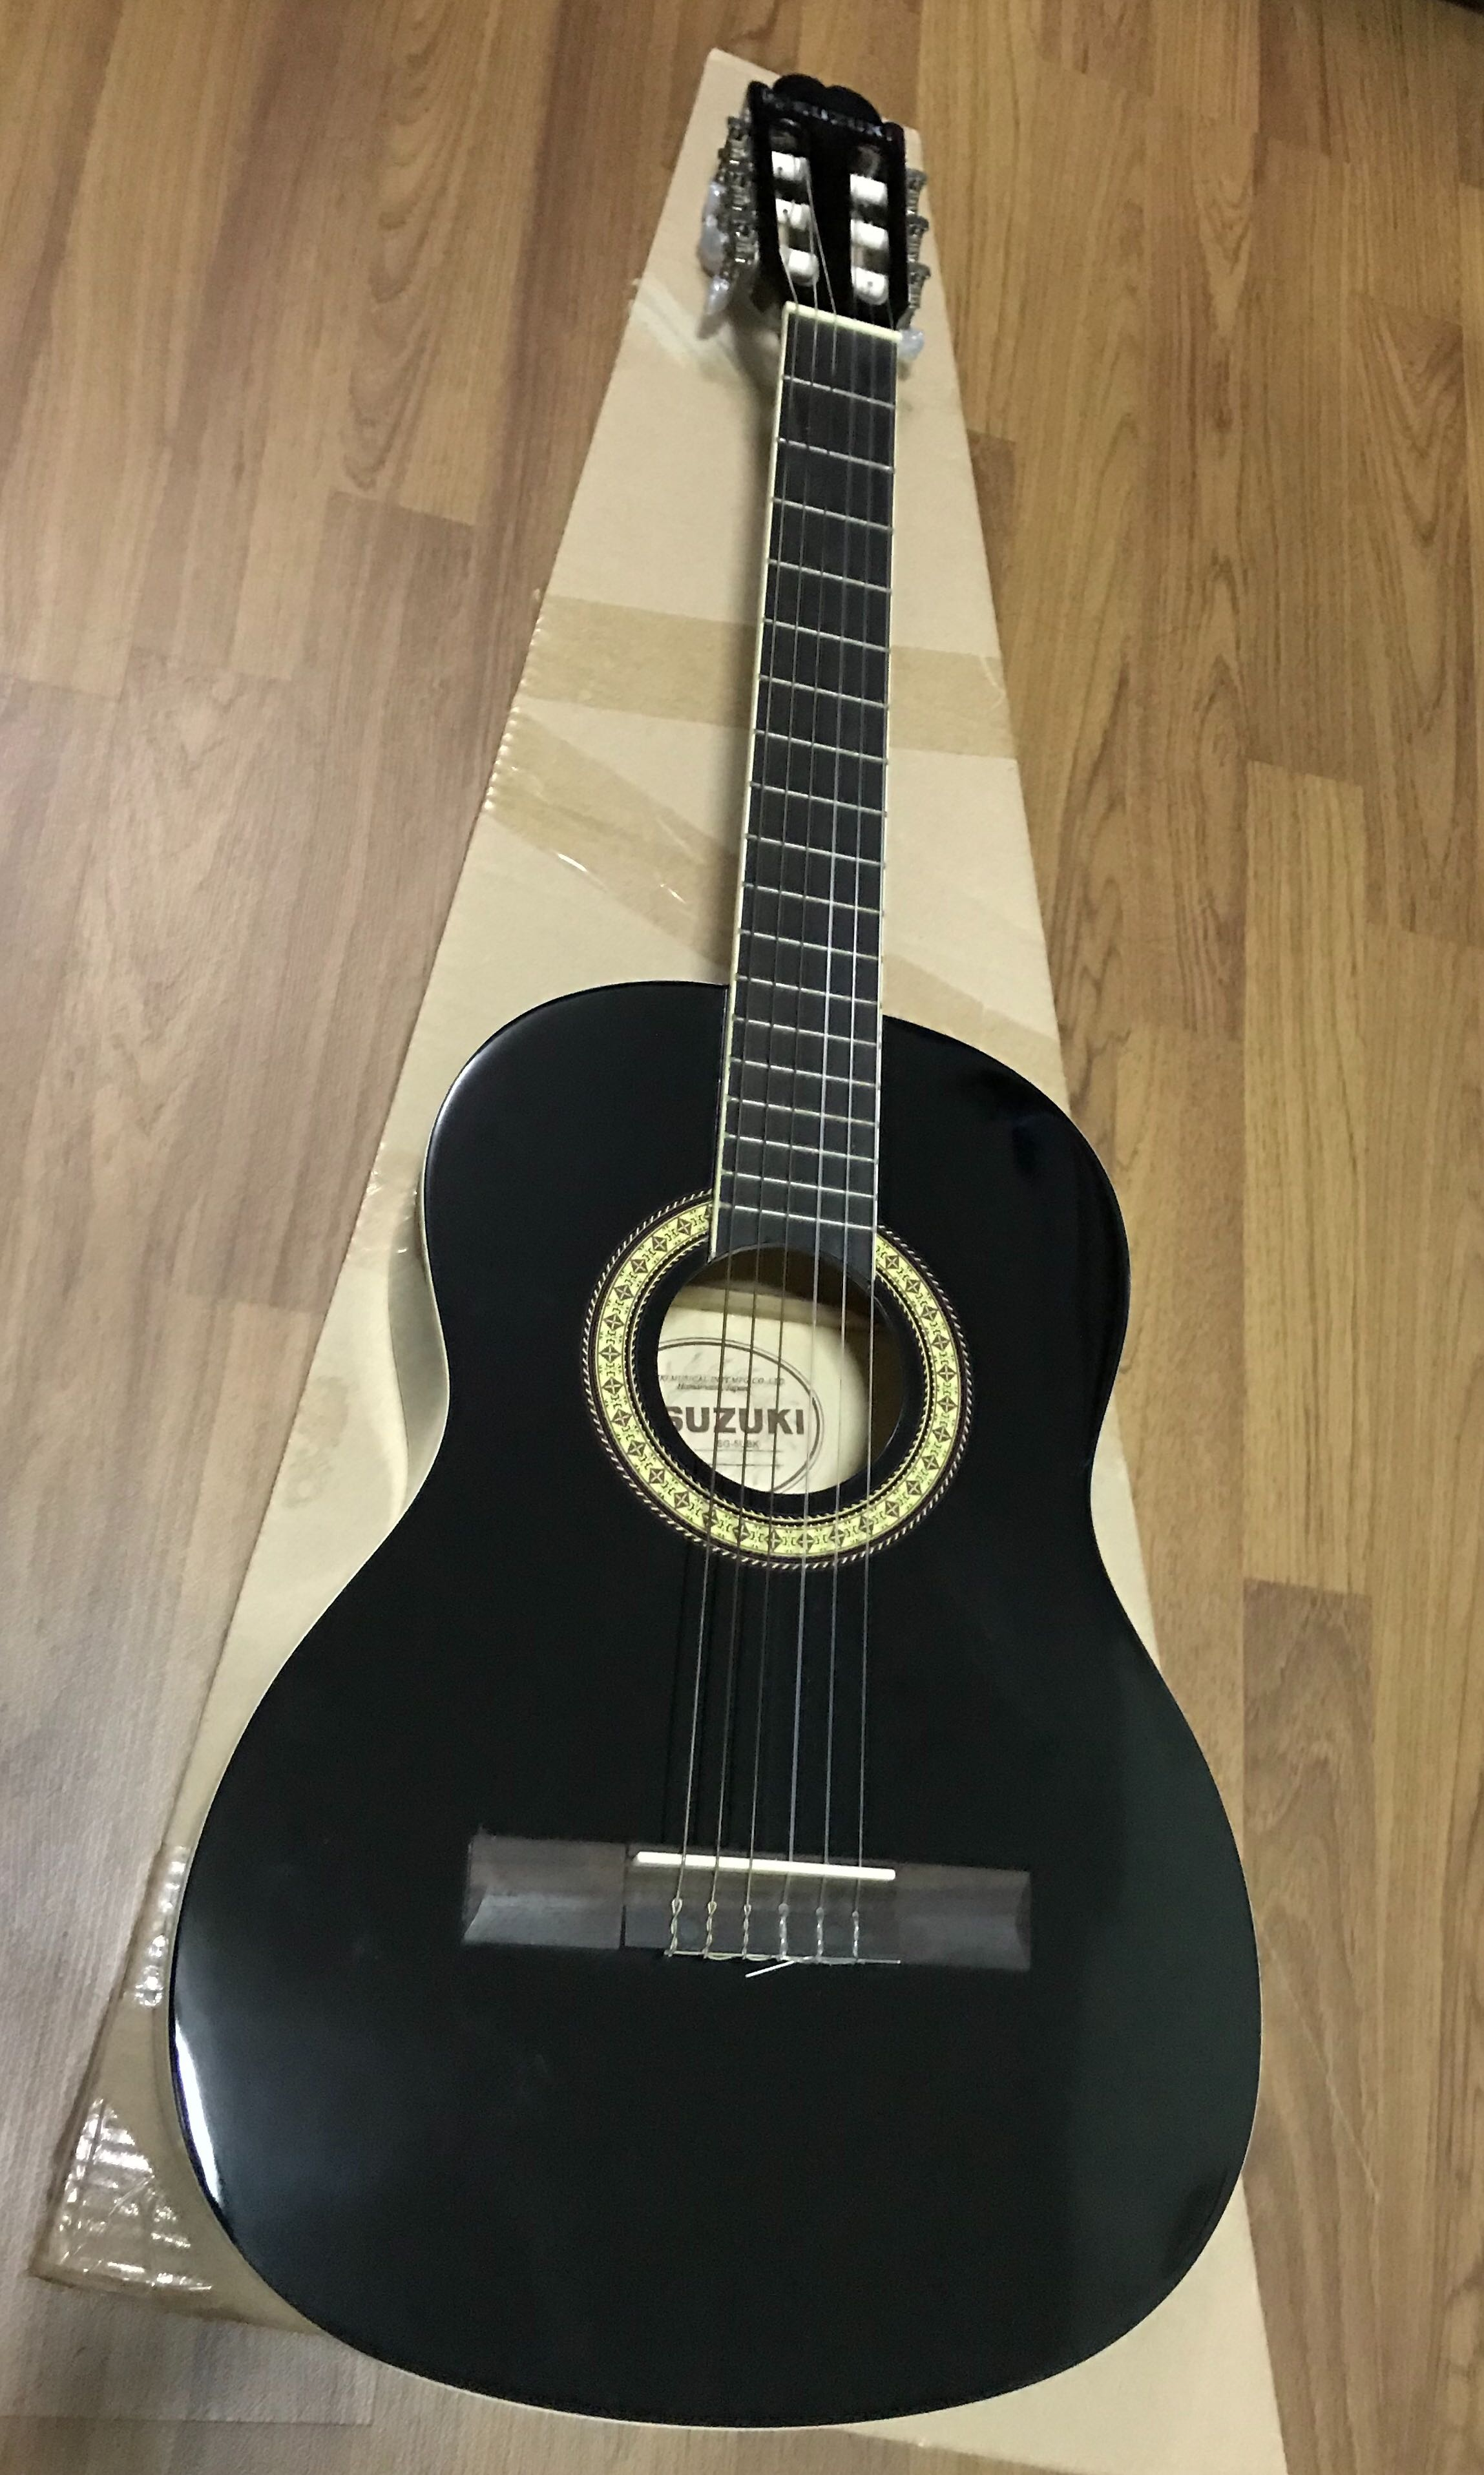 Suzuki Classical Acoustic Guitar Black Colour Condition 10 10